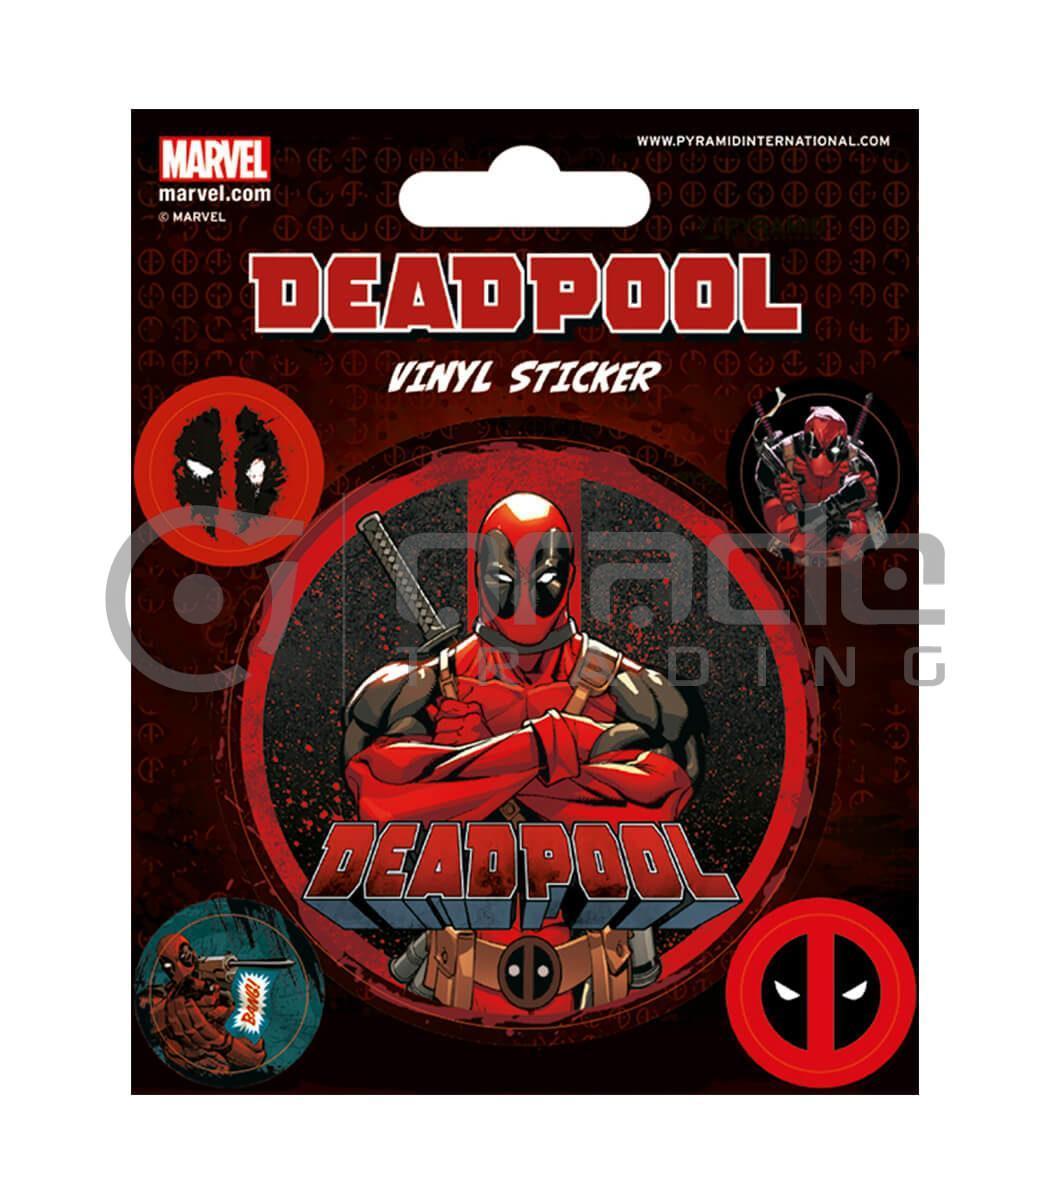 Deadpool Vinyl Sticker Pack